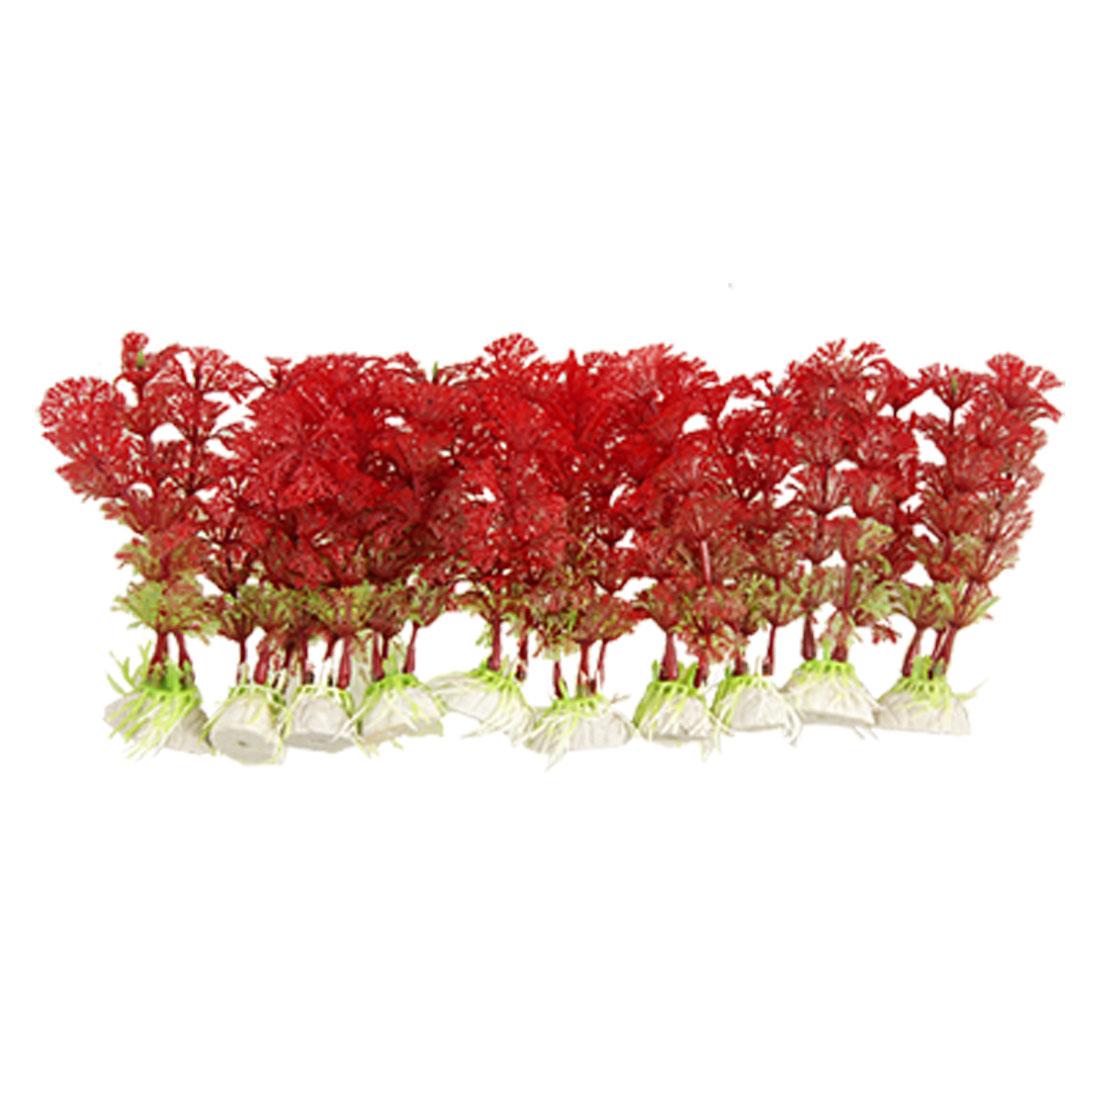 10 Pcs Burgundy Green Plastic Plants Grass Decor for Fish Tank